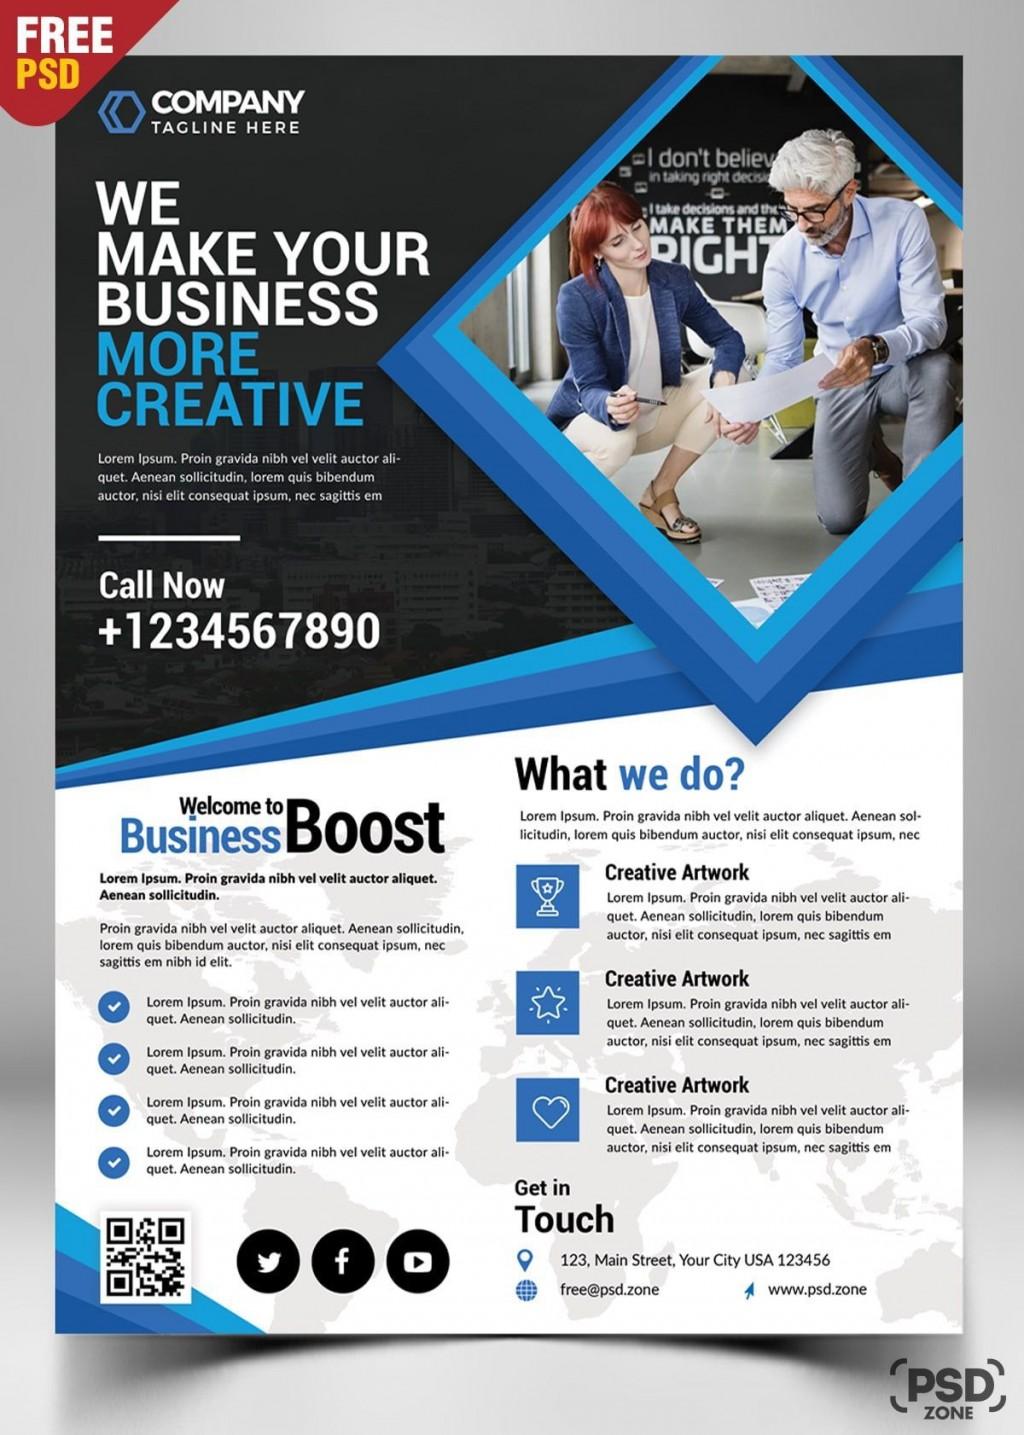 001 Marvelou Busines Flyer Template Free Concept  Psd 2018 Vector Brochure TrainingLarge